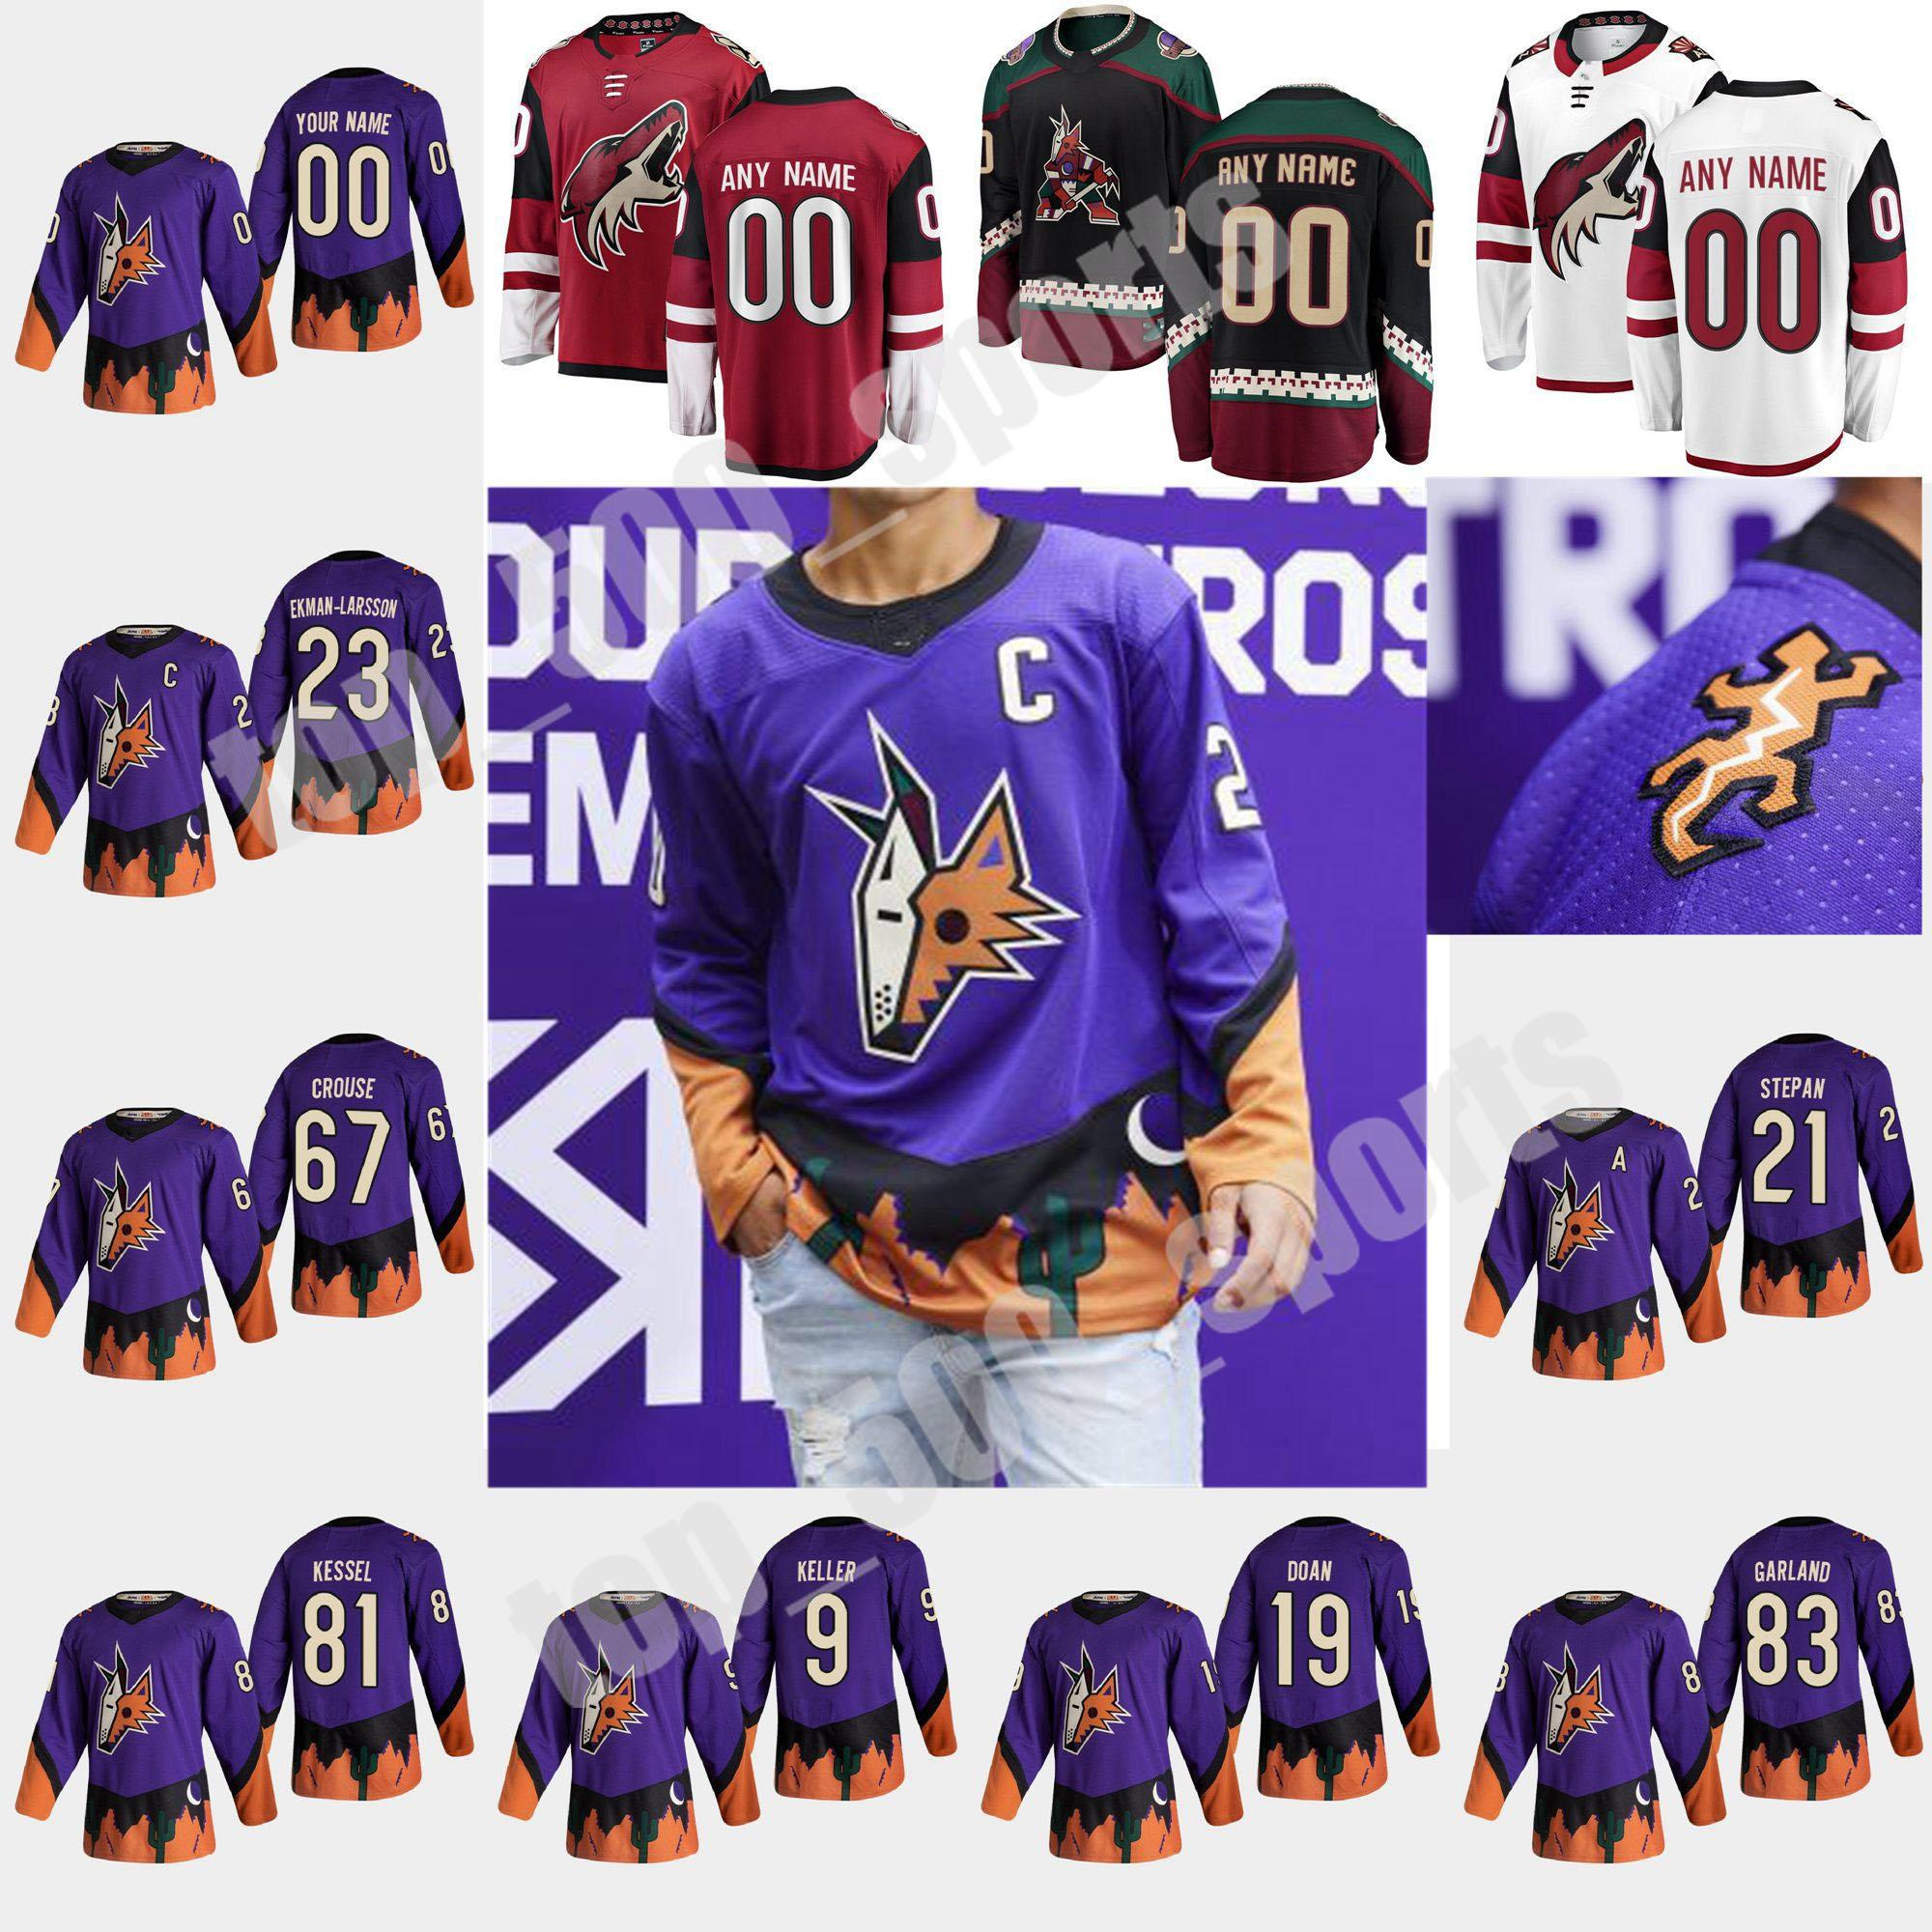 Arizona Coyotes 2021 Reverse Retro Hockey Jerseys 91 Taylor Hall Jersey Phil Kessel Shane Doan Clayton Keller Darcy Kuemper 사용자 정의 스티치